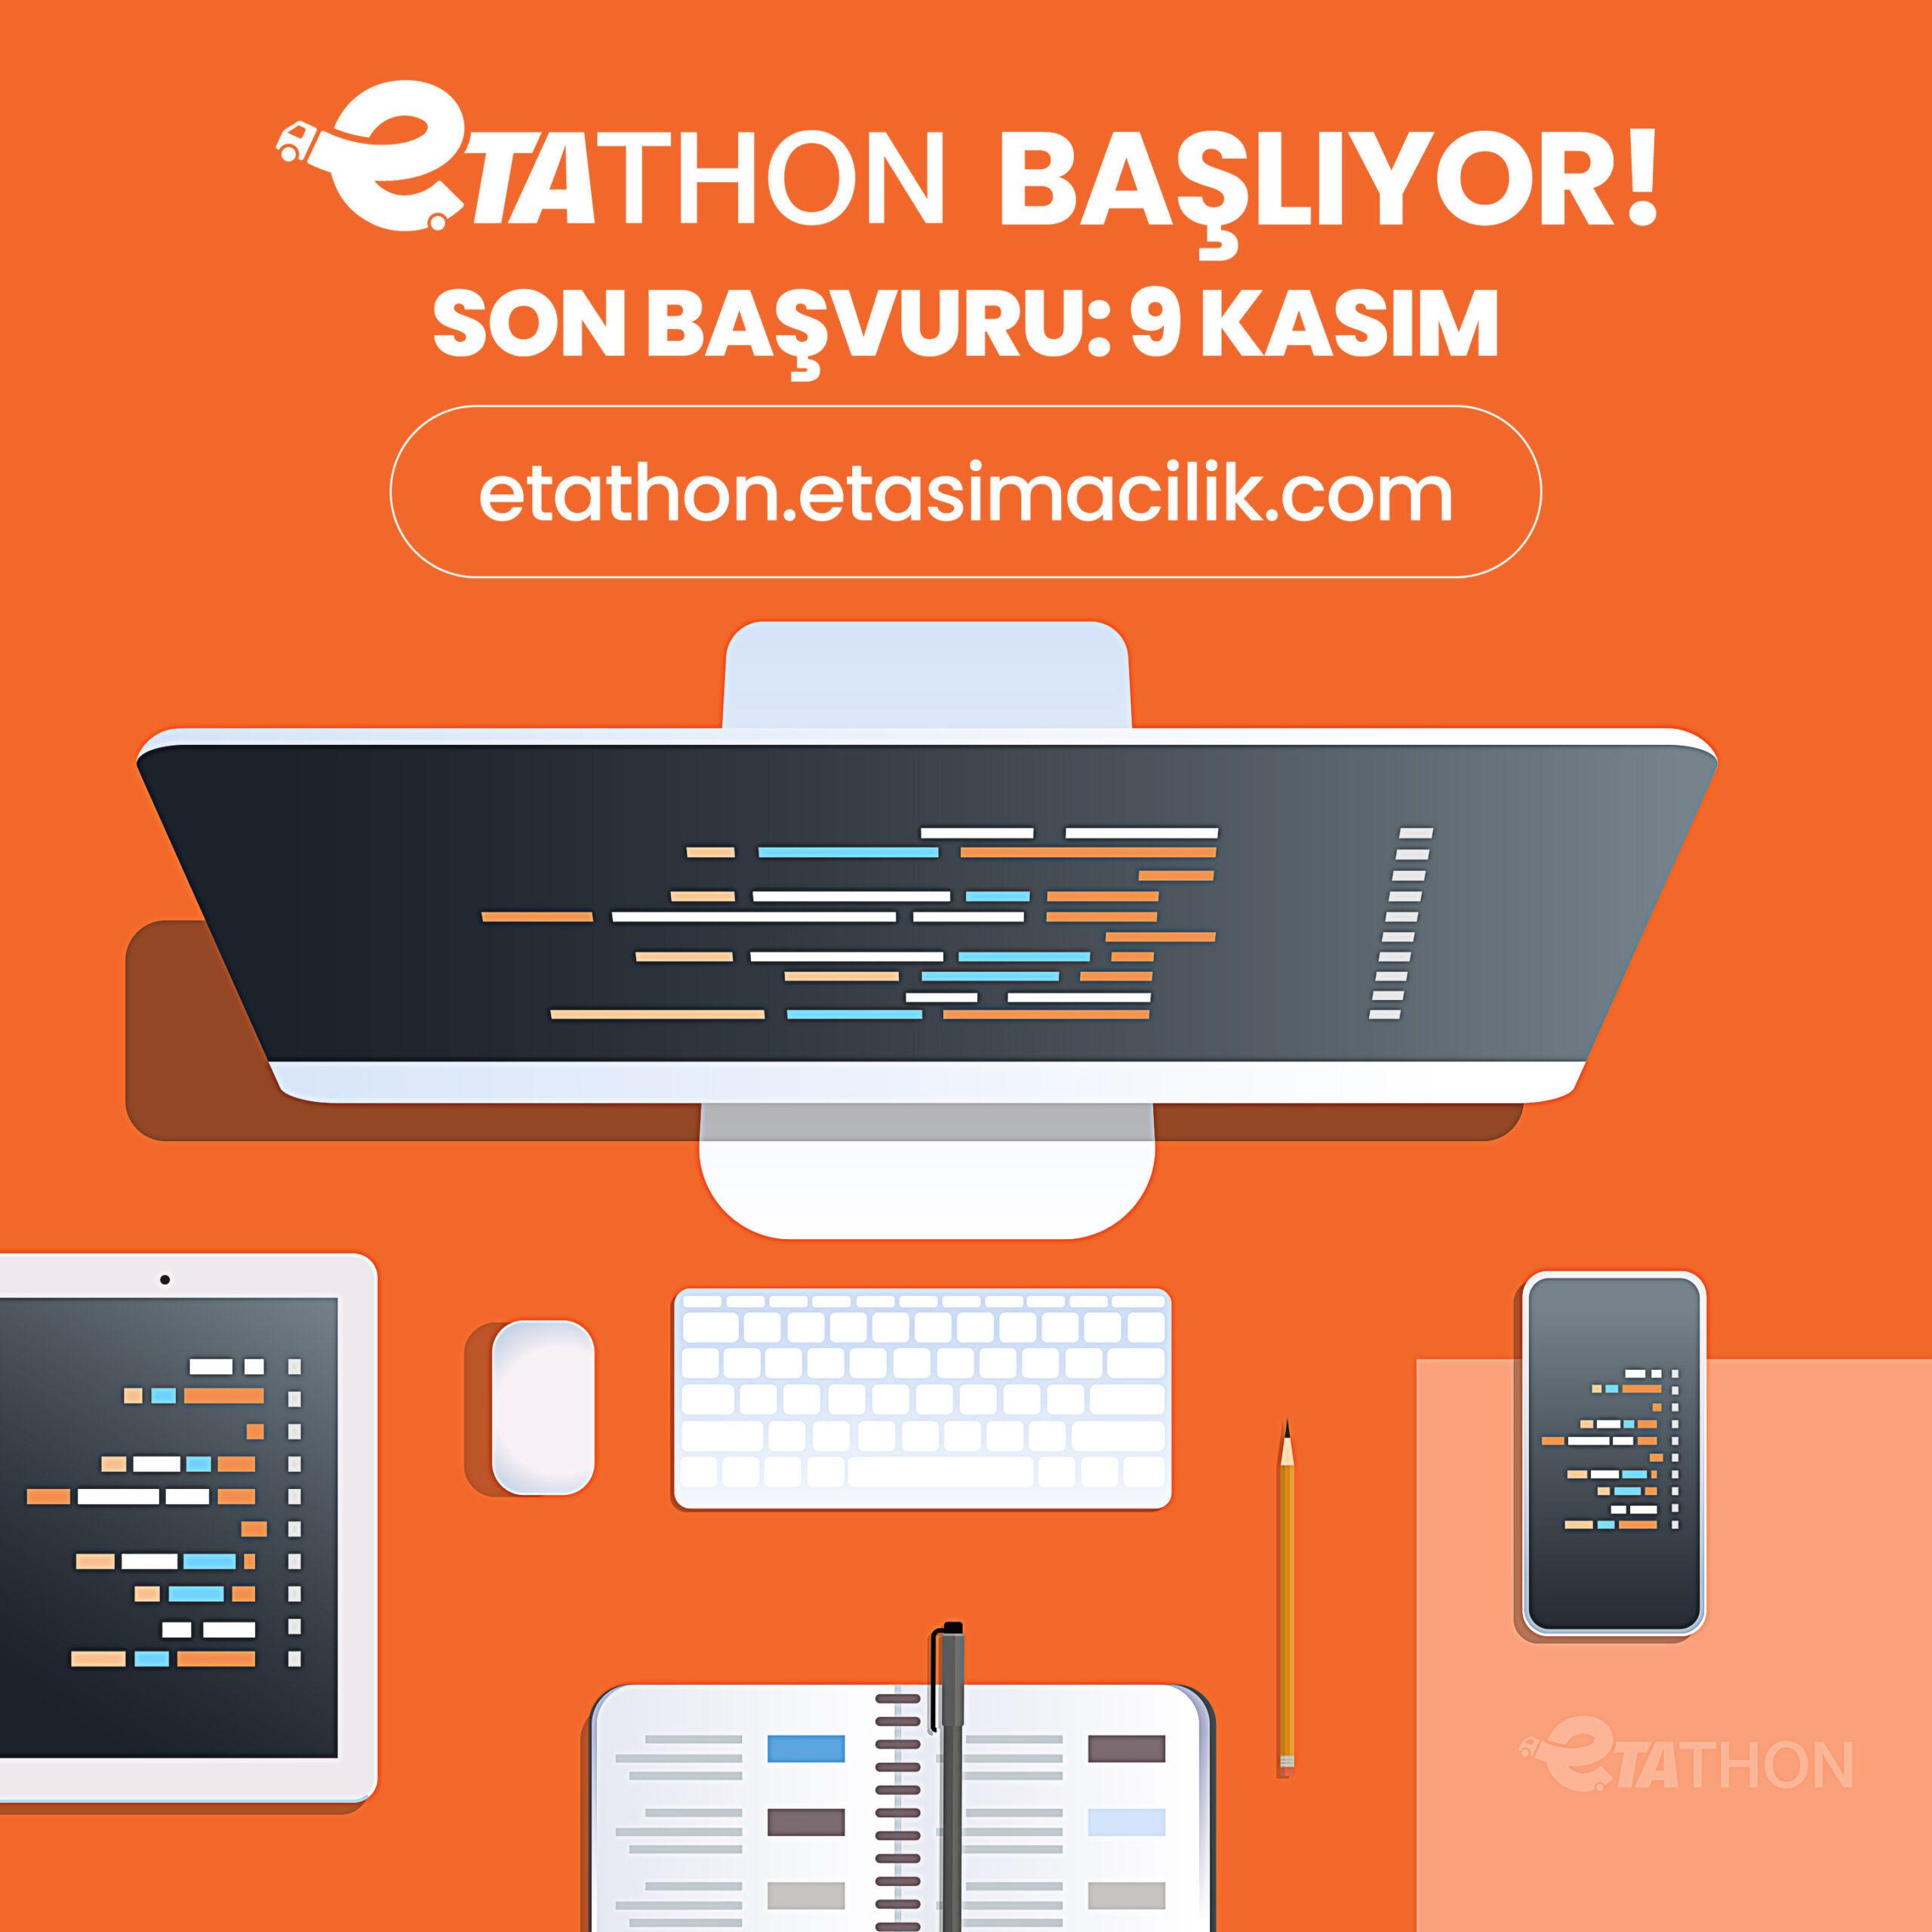 eTAthon